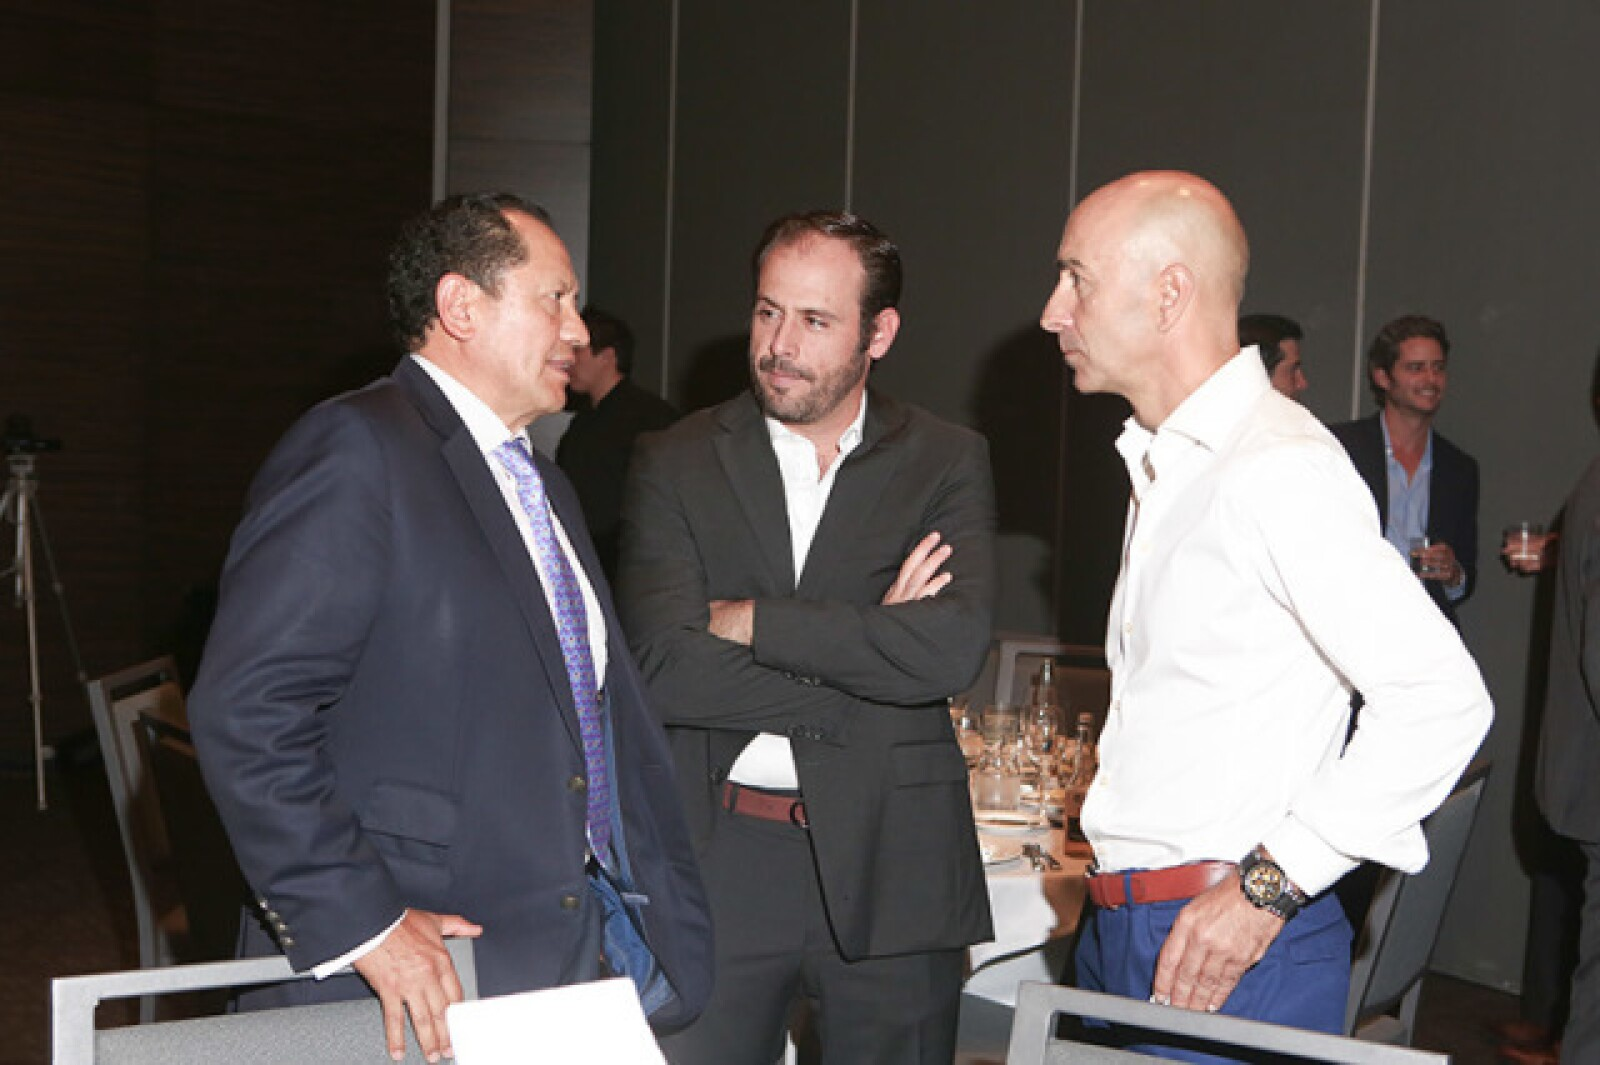 Juan Gramillo, Luis Miguel Pérez, Pako Ayestarán